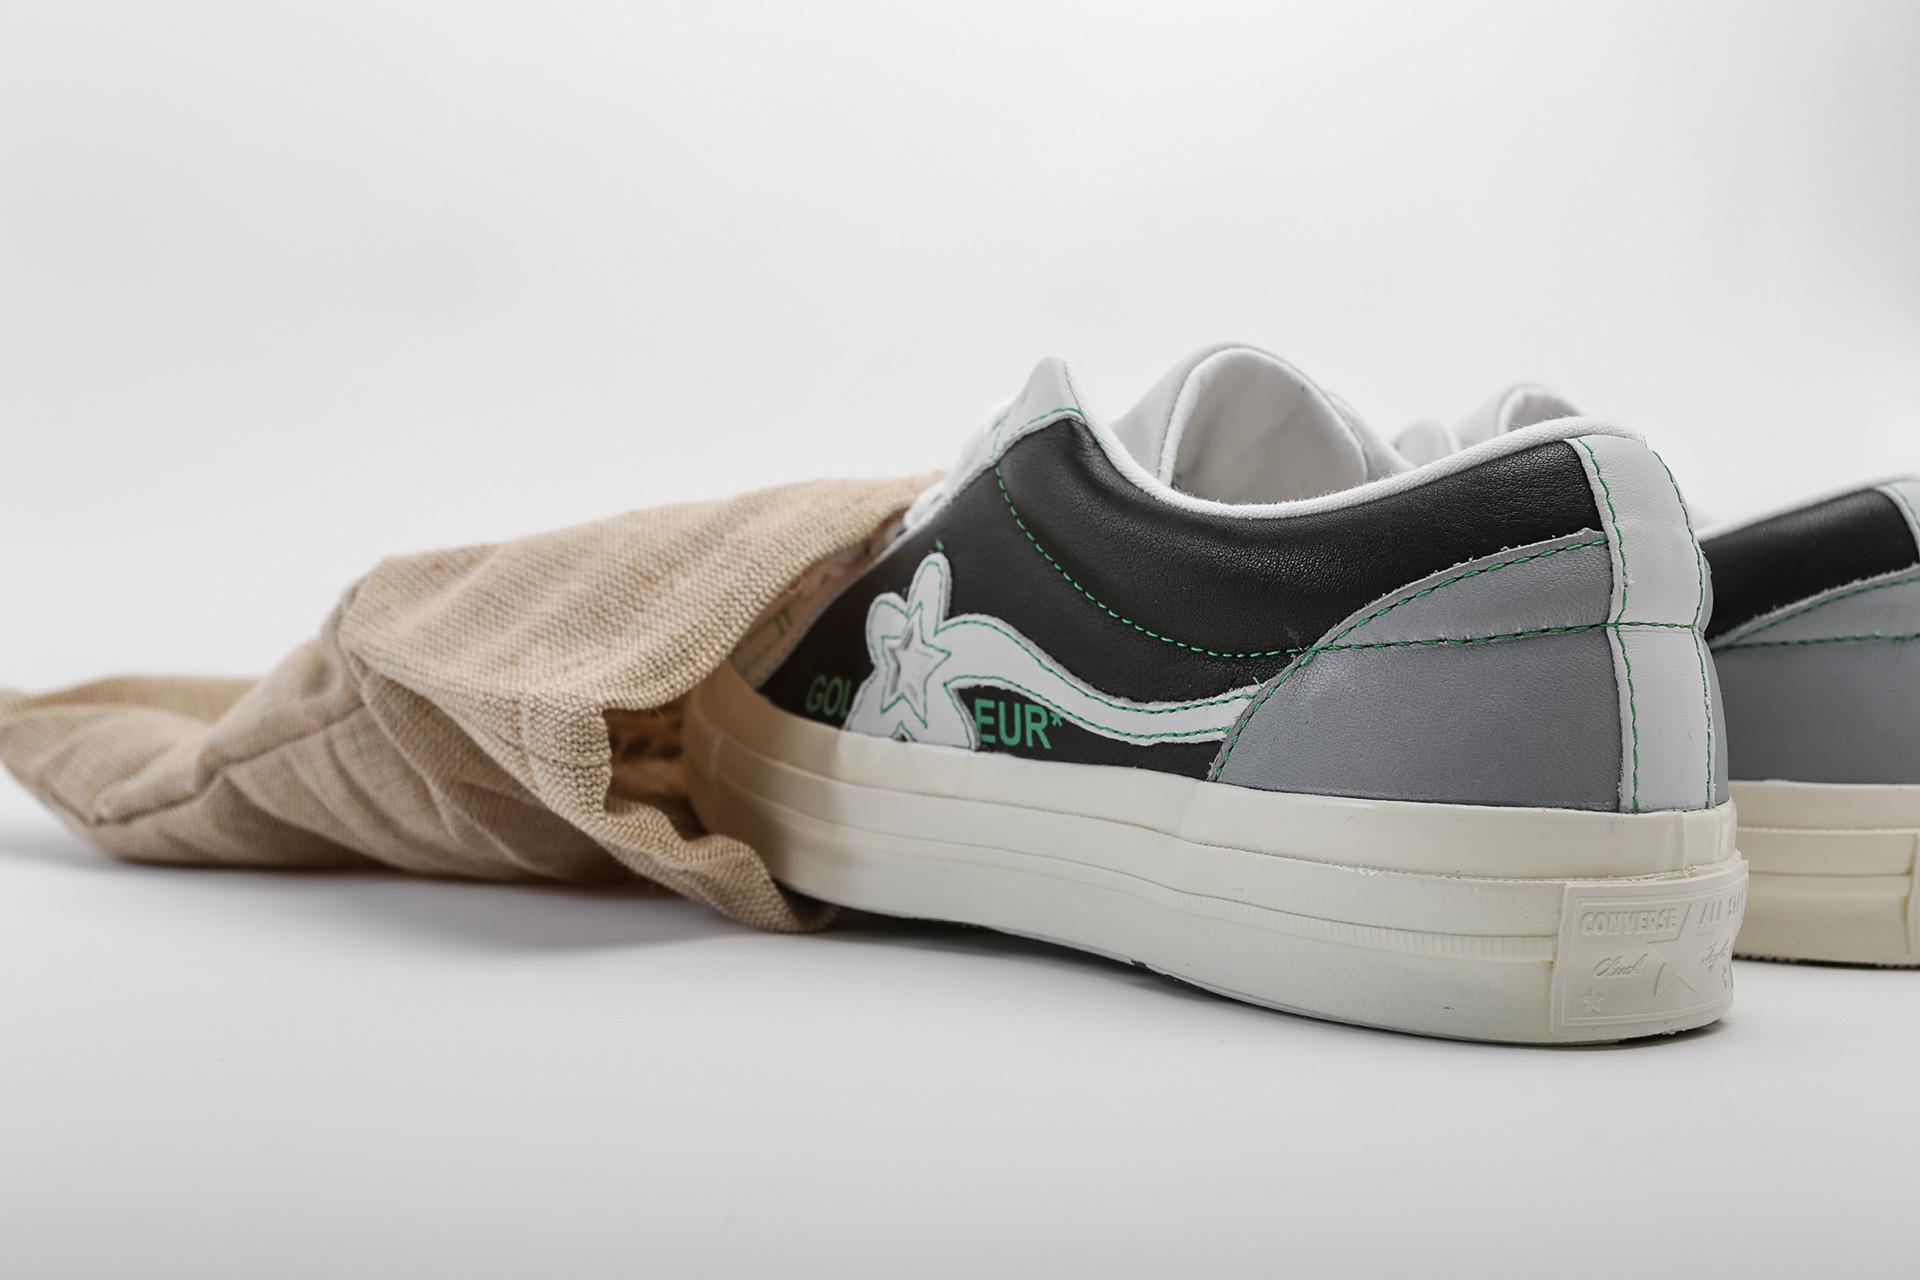 7e1ac686 ... Купить мужские серые кроссовки Converse One Star Golf Le Fleur OX -  фото 6 картинки ...